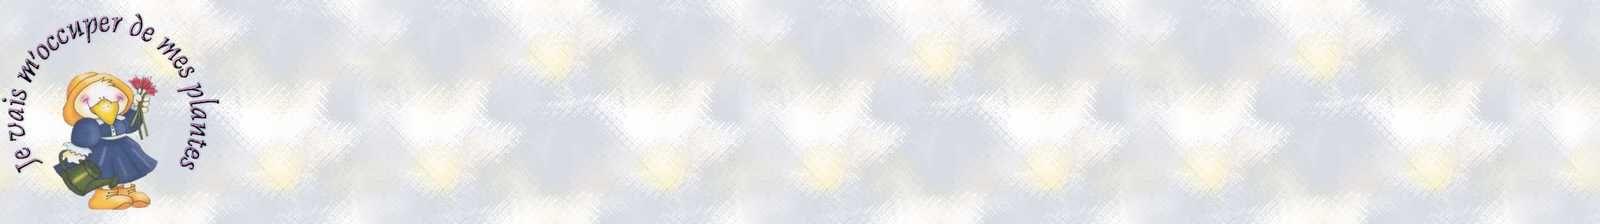 Je vais m'occuper de mes plantes canard IM &amp&#x3B; A4 h l &amp&#x3B; outlook &amp&#x3B; enveloppe &amp&#x3B; 2 cartes A5 &amp&#x3B; signets   je_vais_moccuper_de_mes_plantes_canardfillearrosoir_001_00